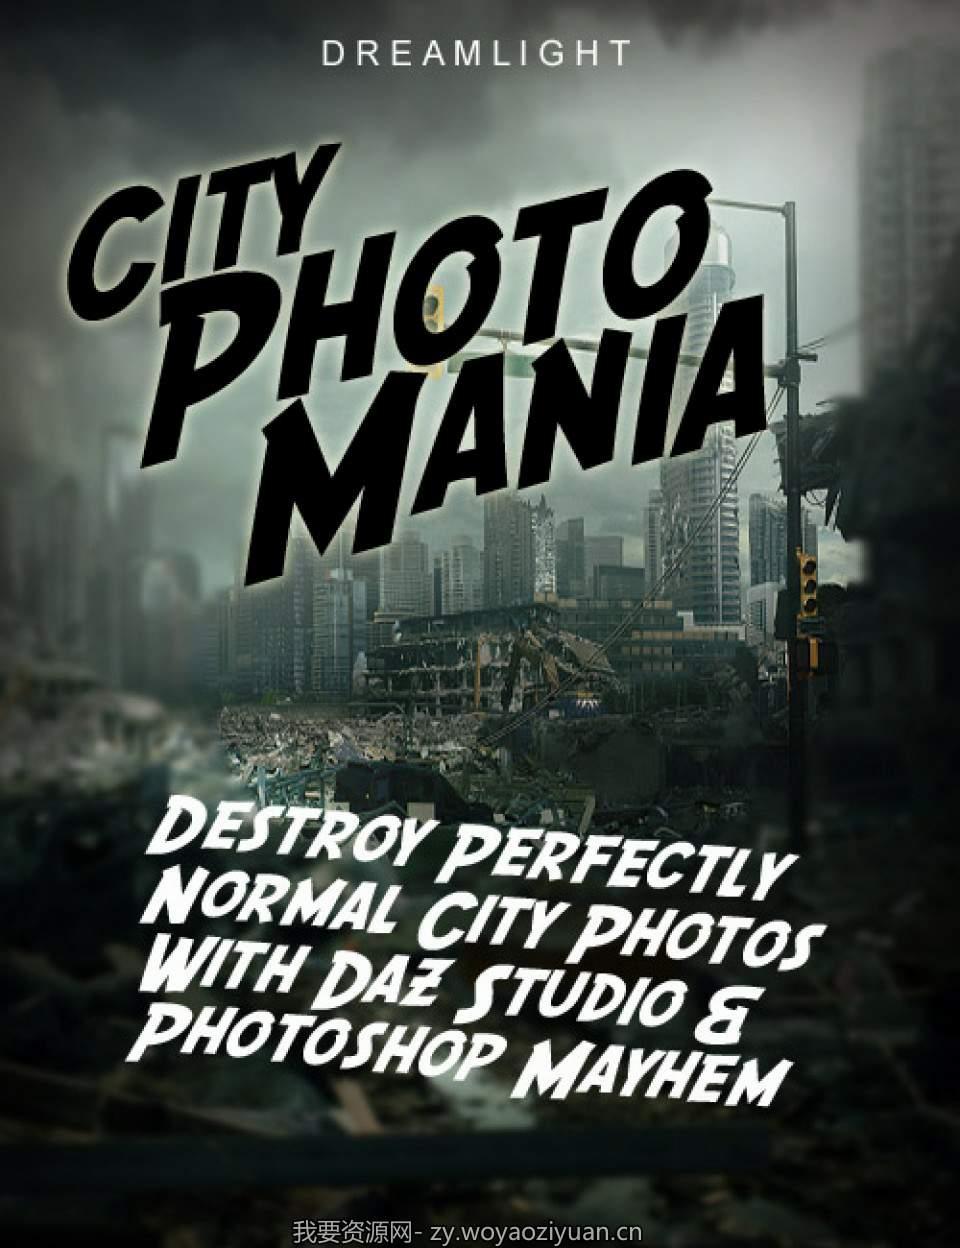 City Photo Mania – Destroy Photos With DAZ Studio